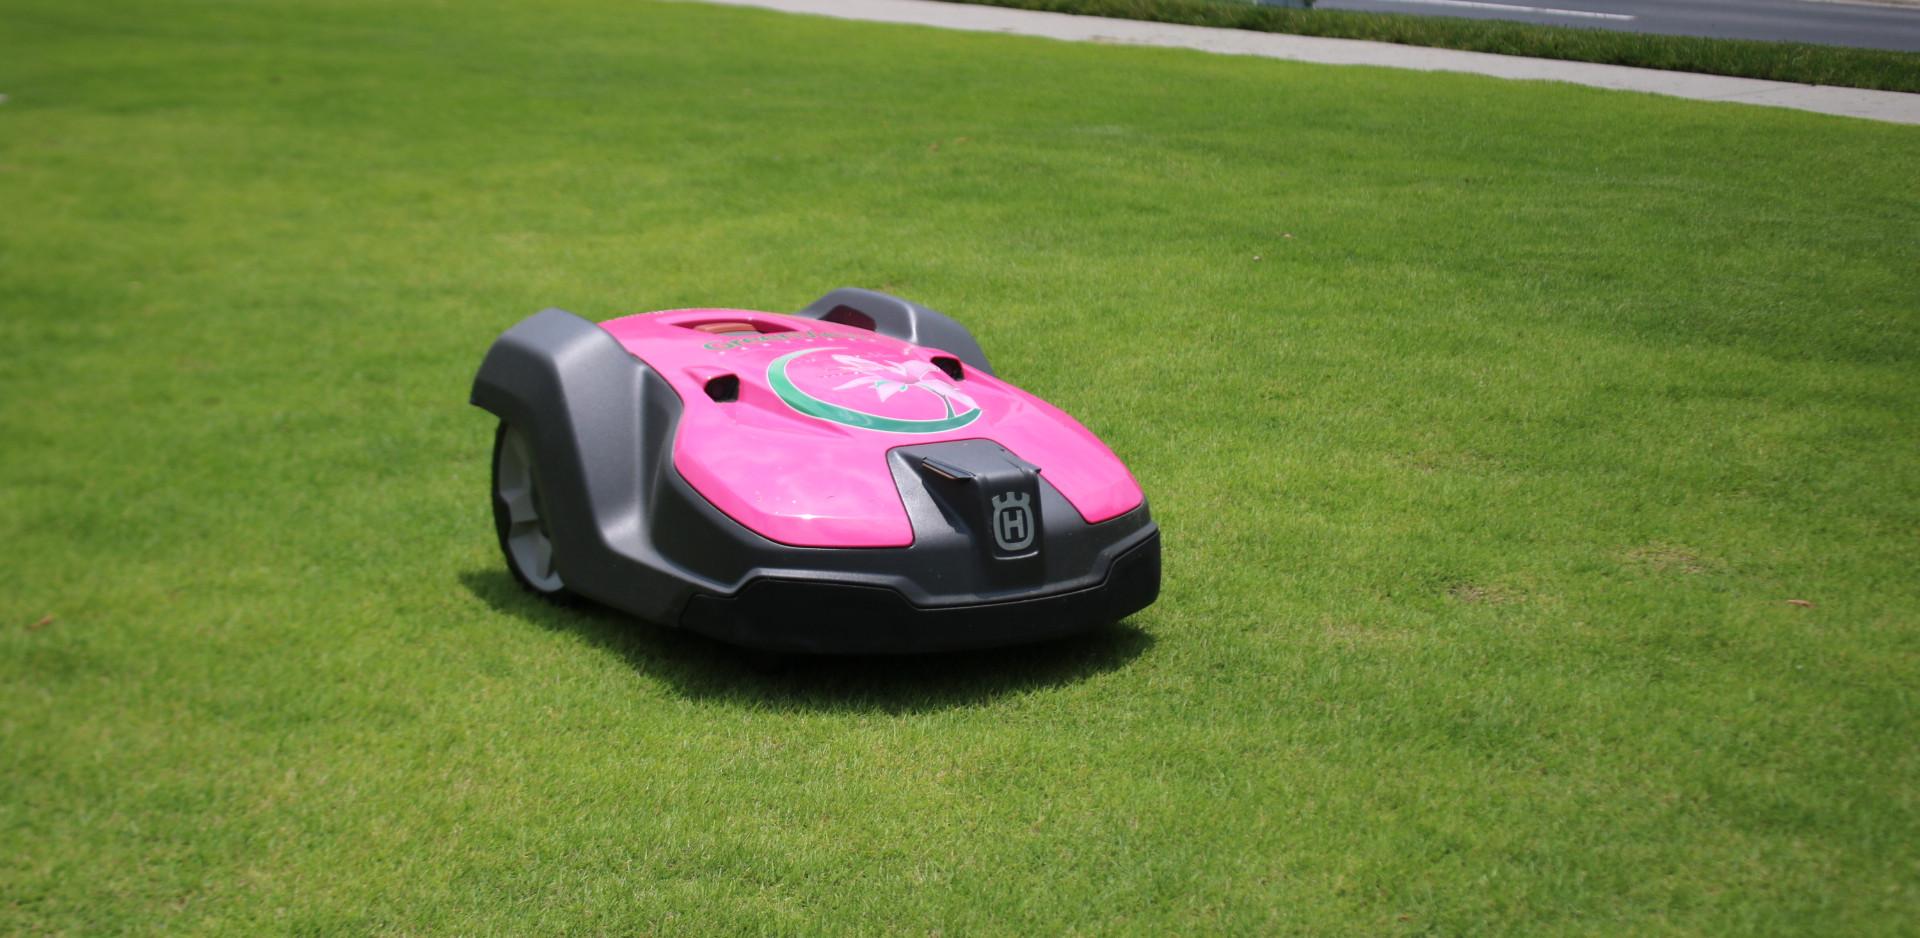 Centregreen Autonomous Mower